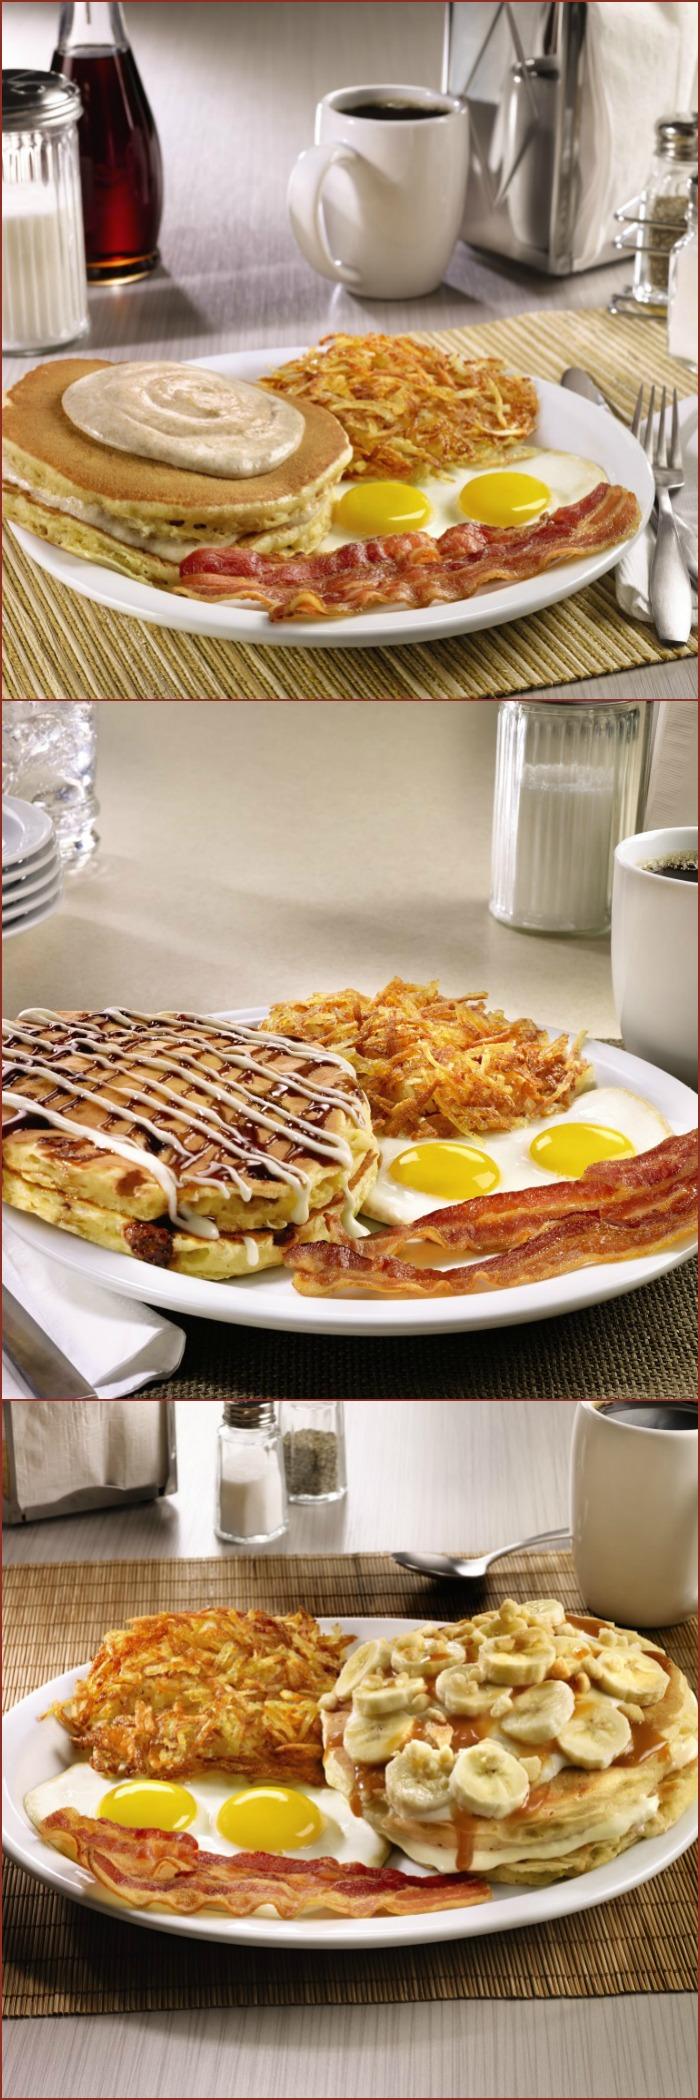 dennys-holiday-pancakes-pumpkin-pecan-or-caramel-pancakes